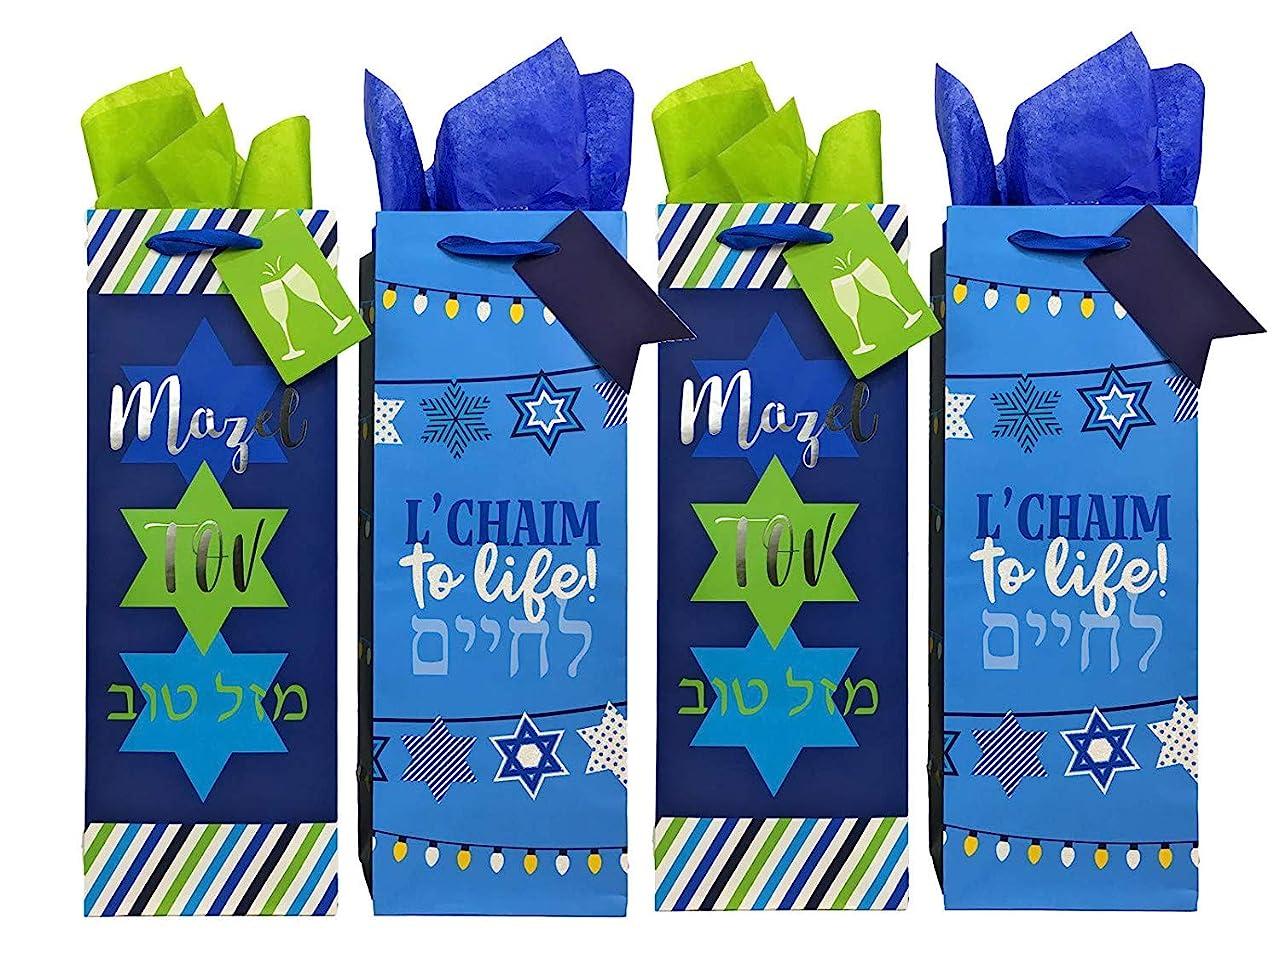 Wine Bottle Gift Bags with Tissue Passover Hanukkah (Mazel Tov)